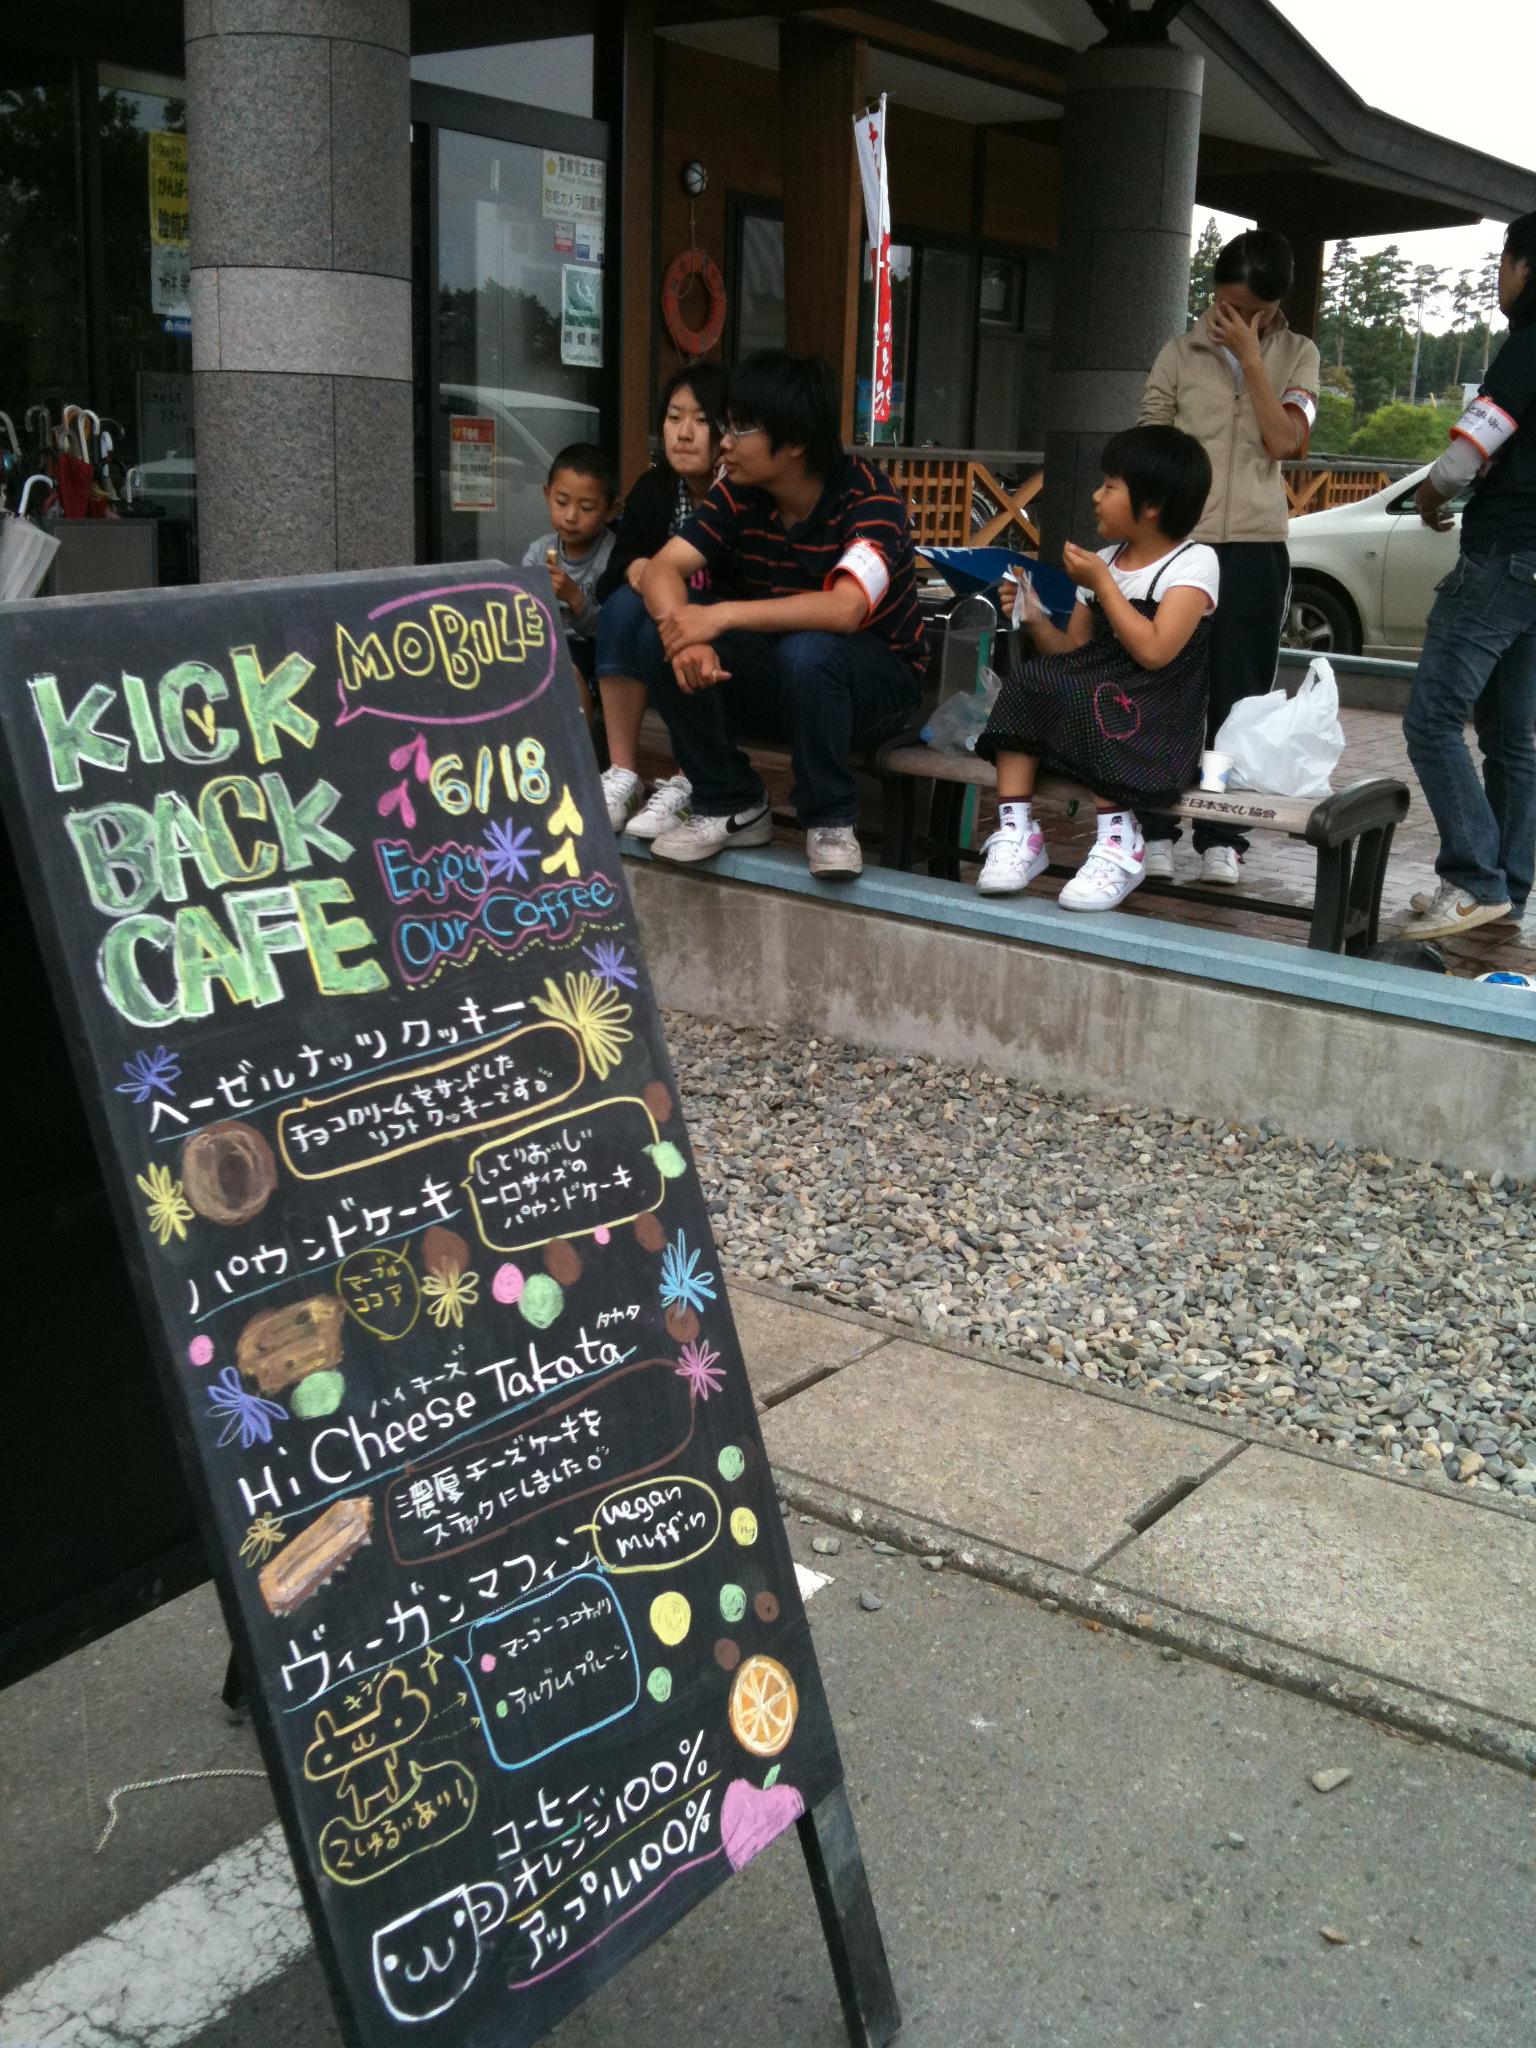 http://www.kickbackcafe.jp/support2/report/IMG_1121.jpg